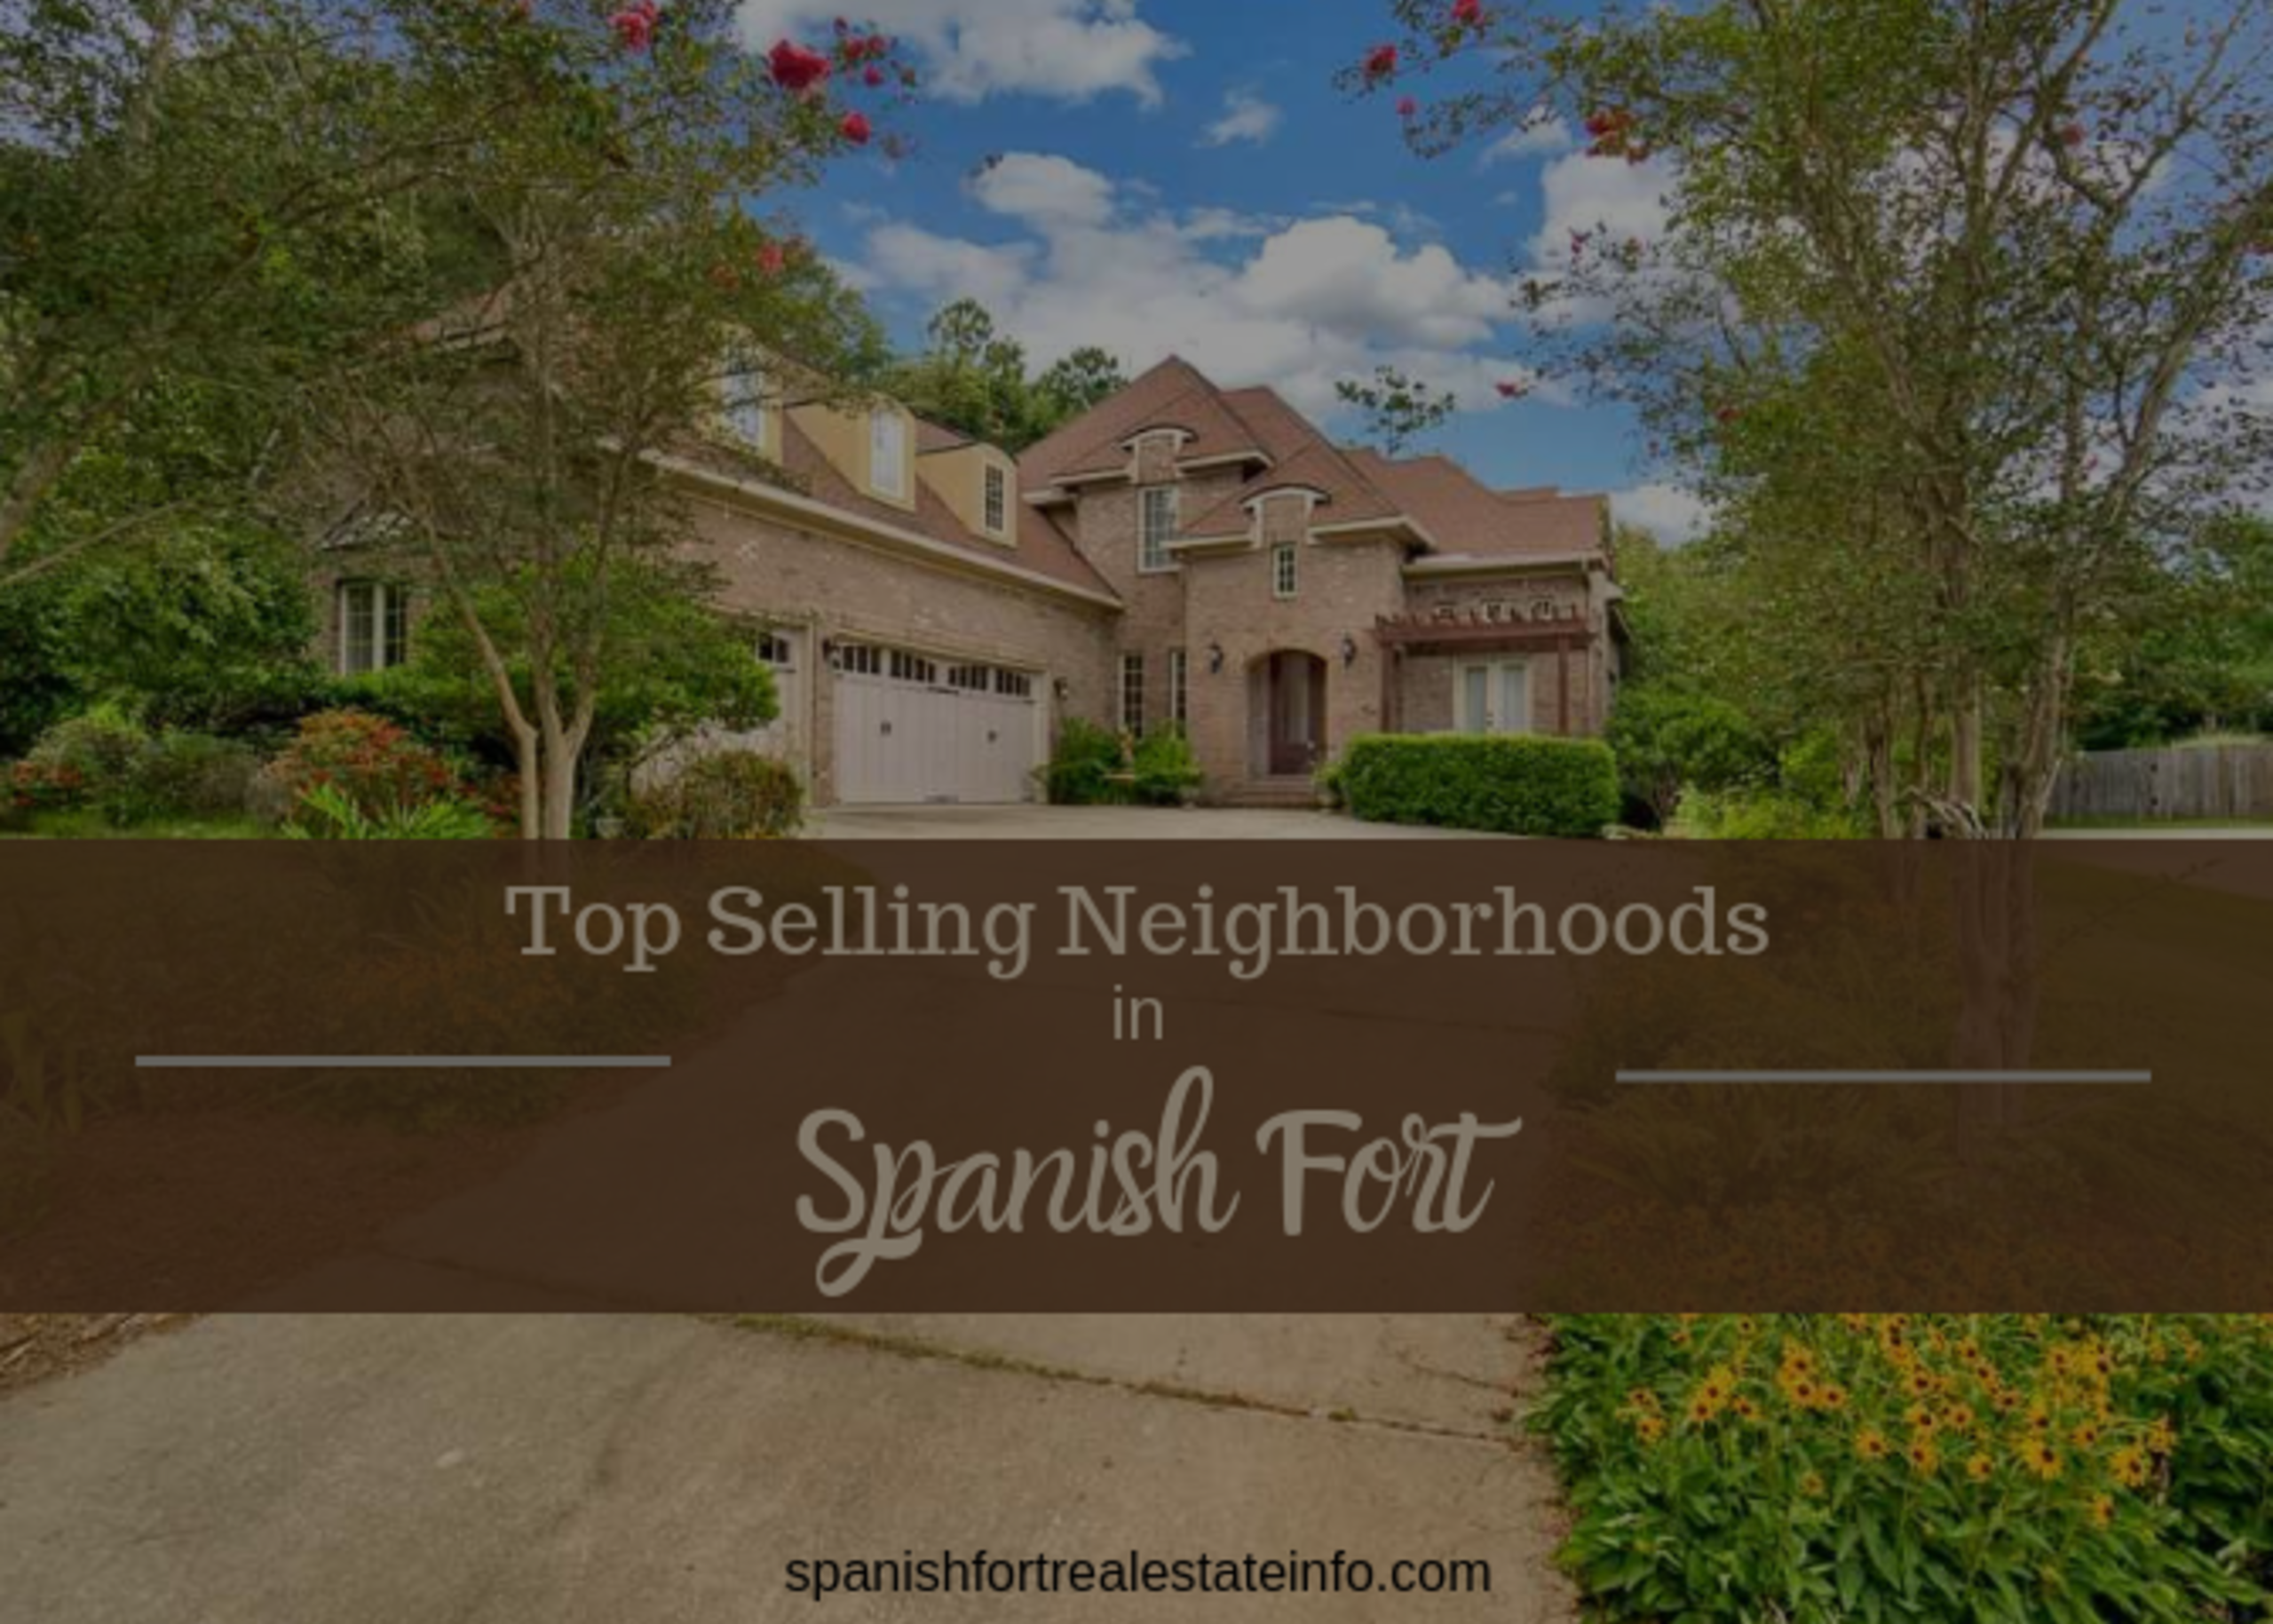 Top Selling Neighborhoods in Spanish Fort – August 2019